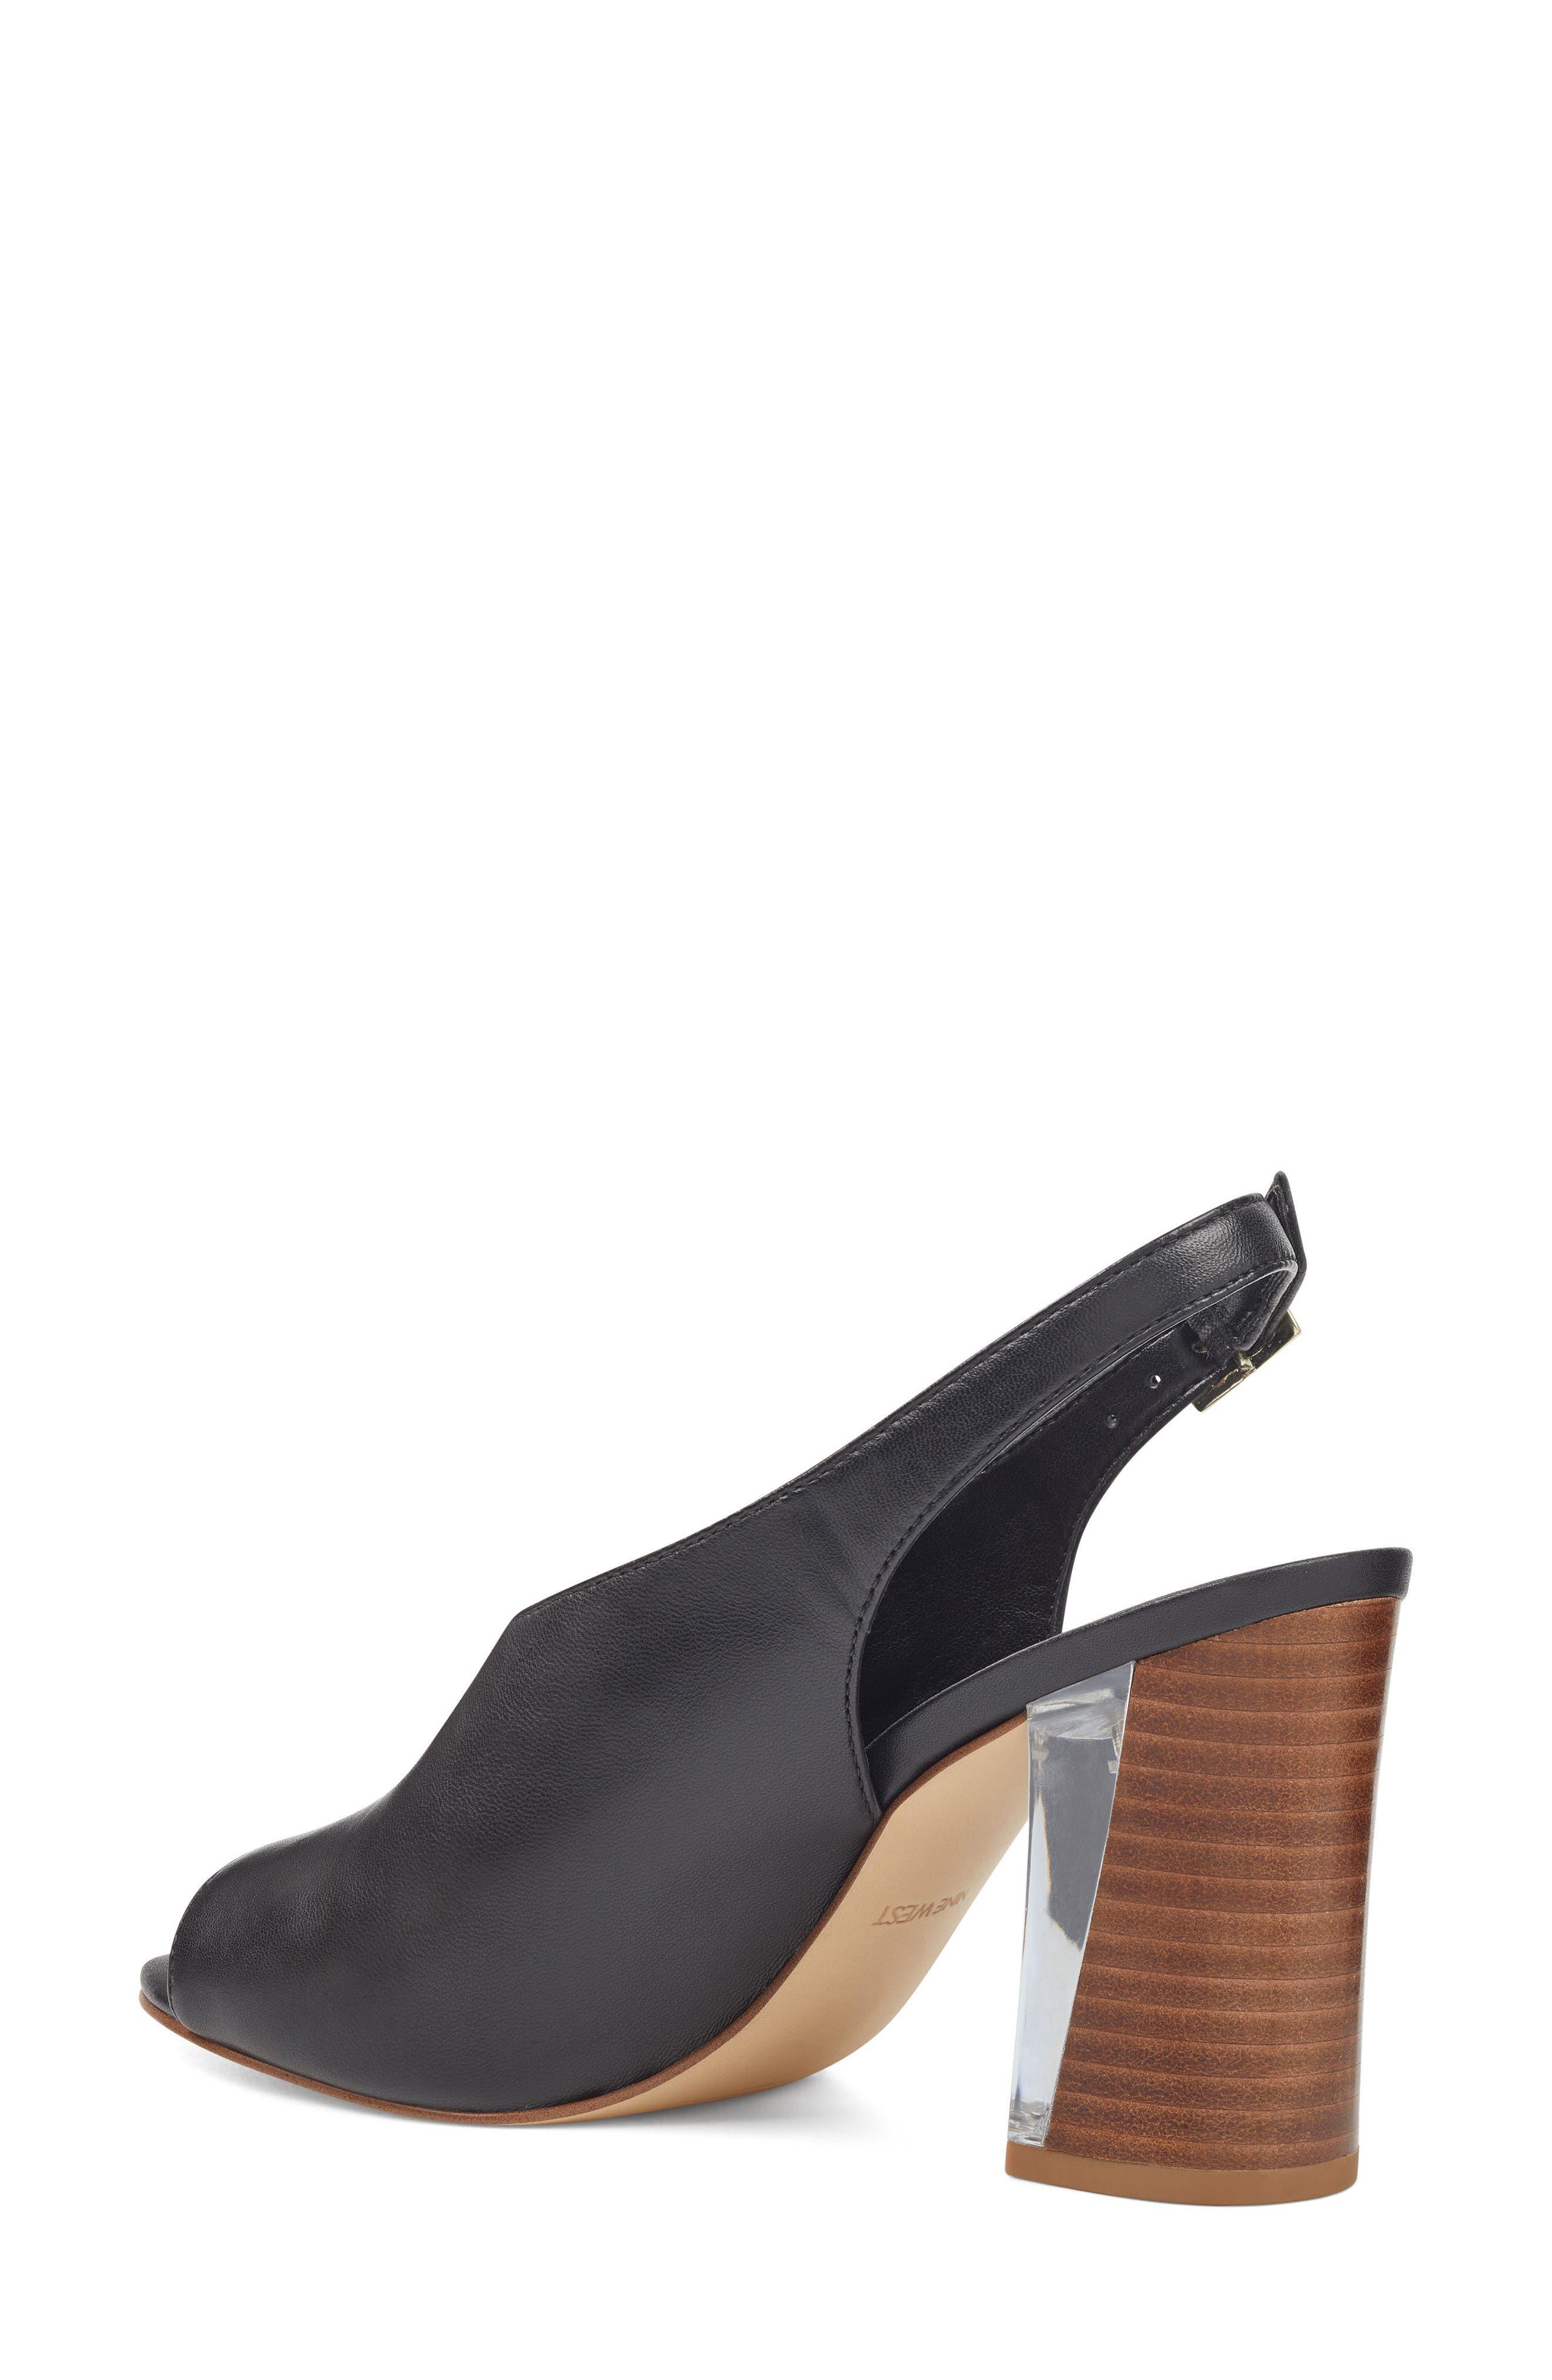 Morenzo Slingback Sandal,                             Alternate thumbnail 2, color,                             BLACK LEATHER